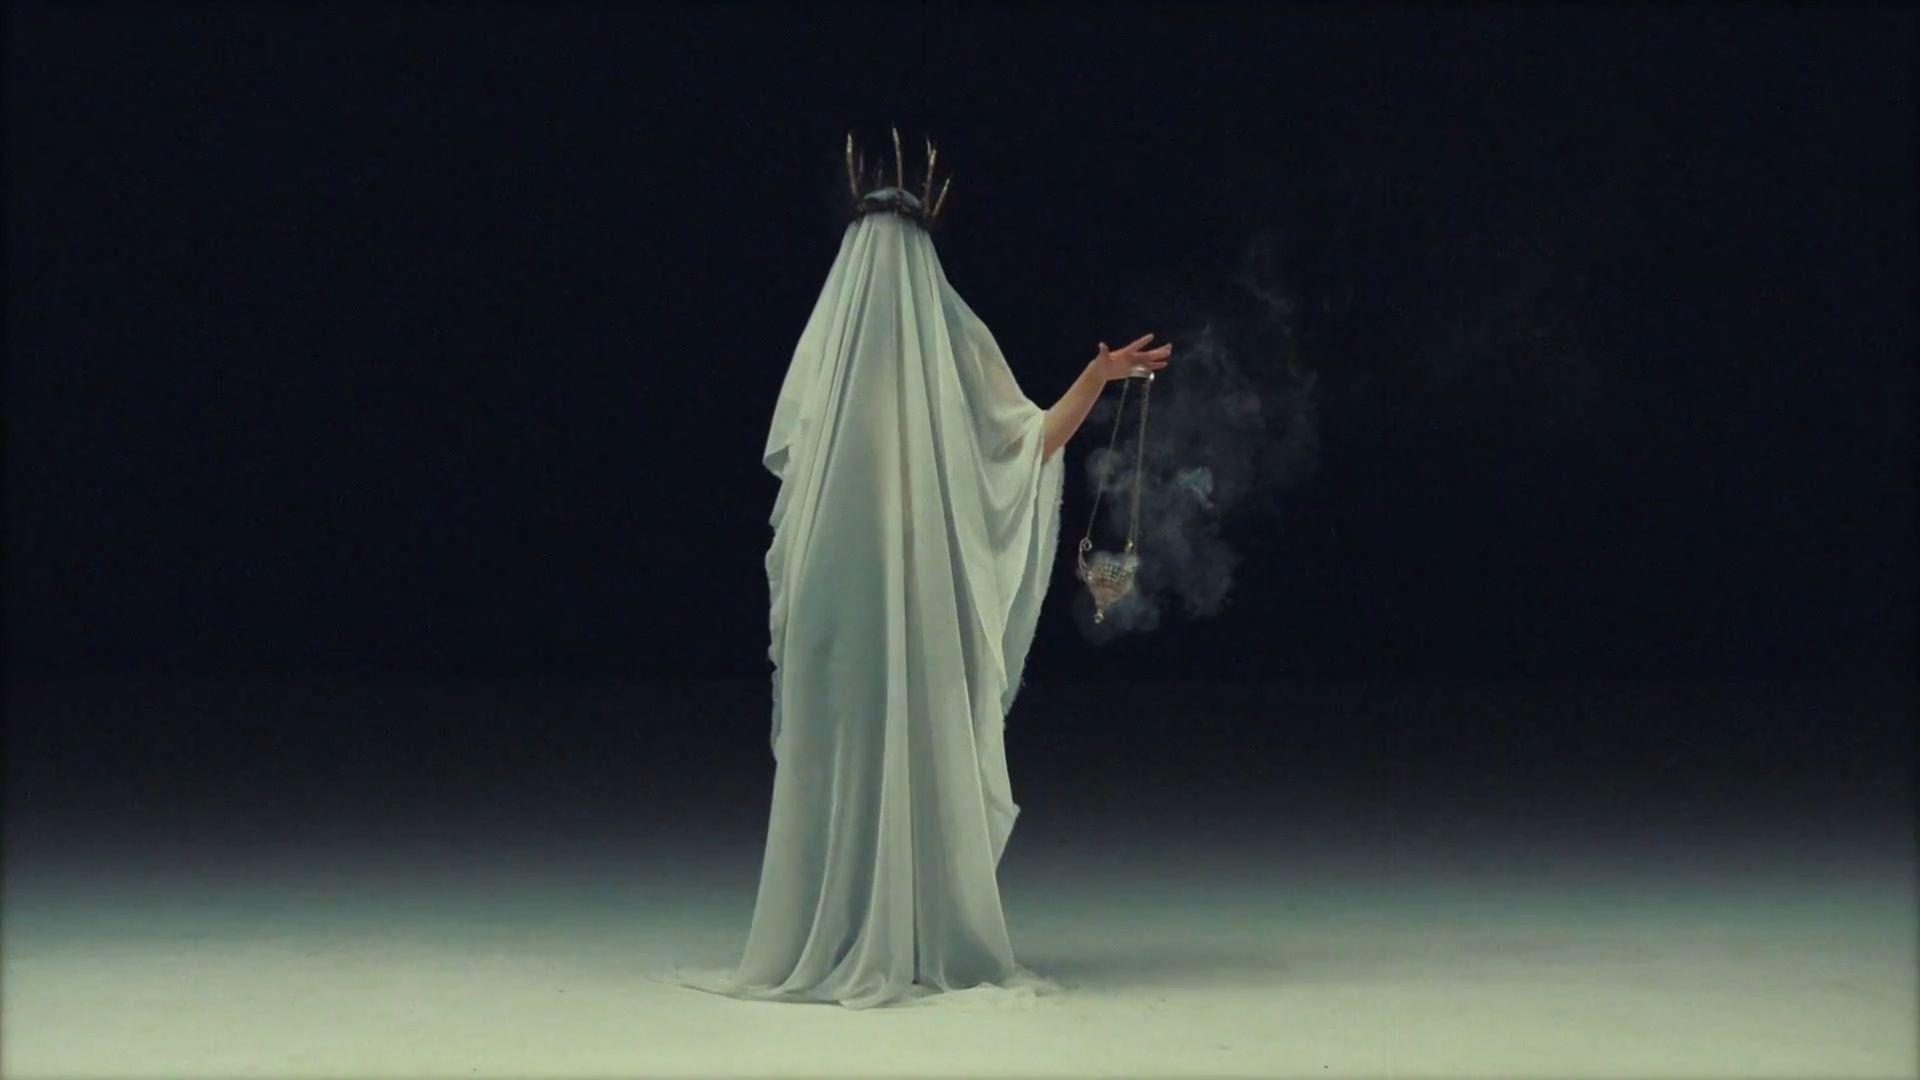 Клип Bring Me The Horizon - Throne смотреть онлайн: all-stars.su/5742-bring-me-the-horizon-throne.html